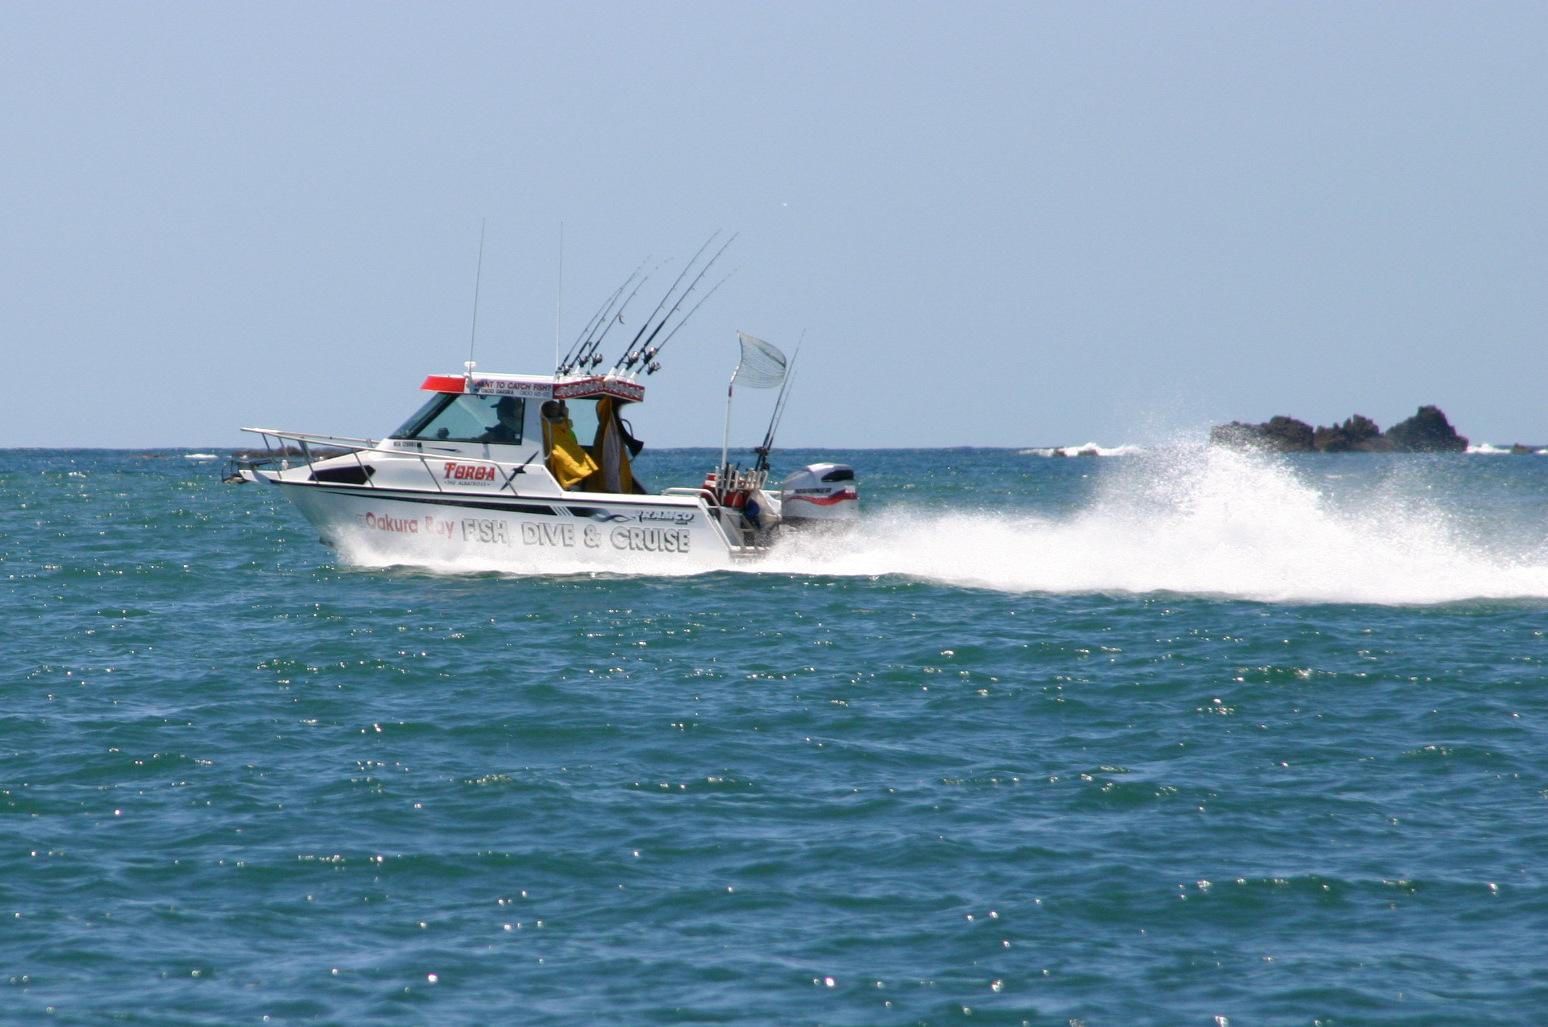 Oakura Fish, Dive & Cruise